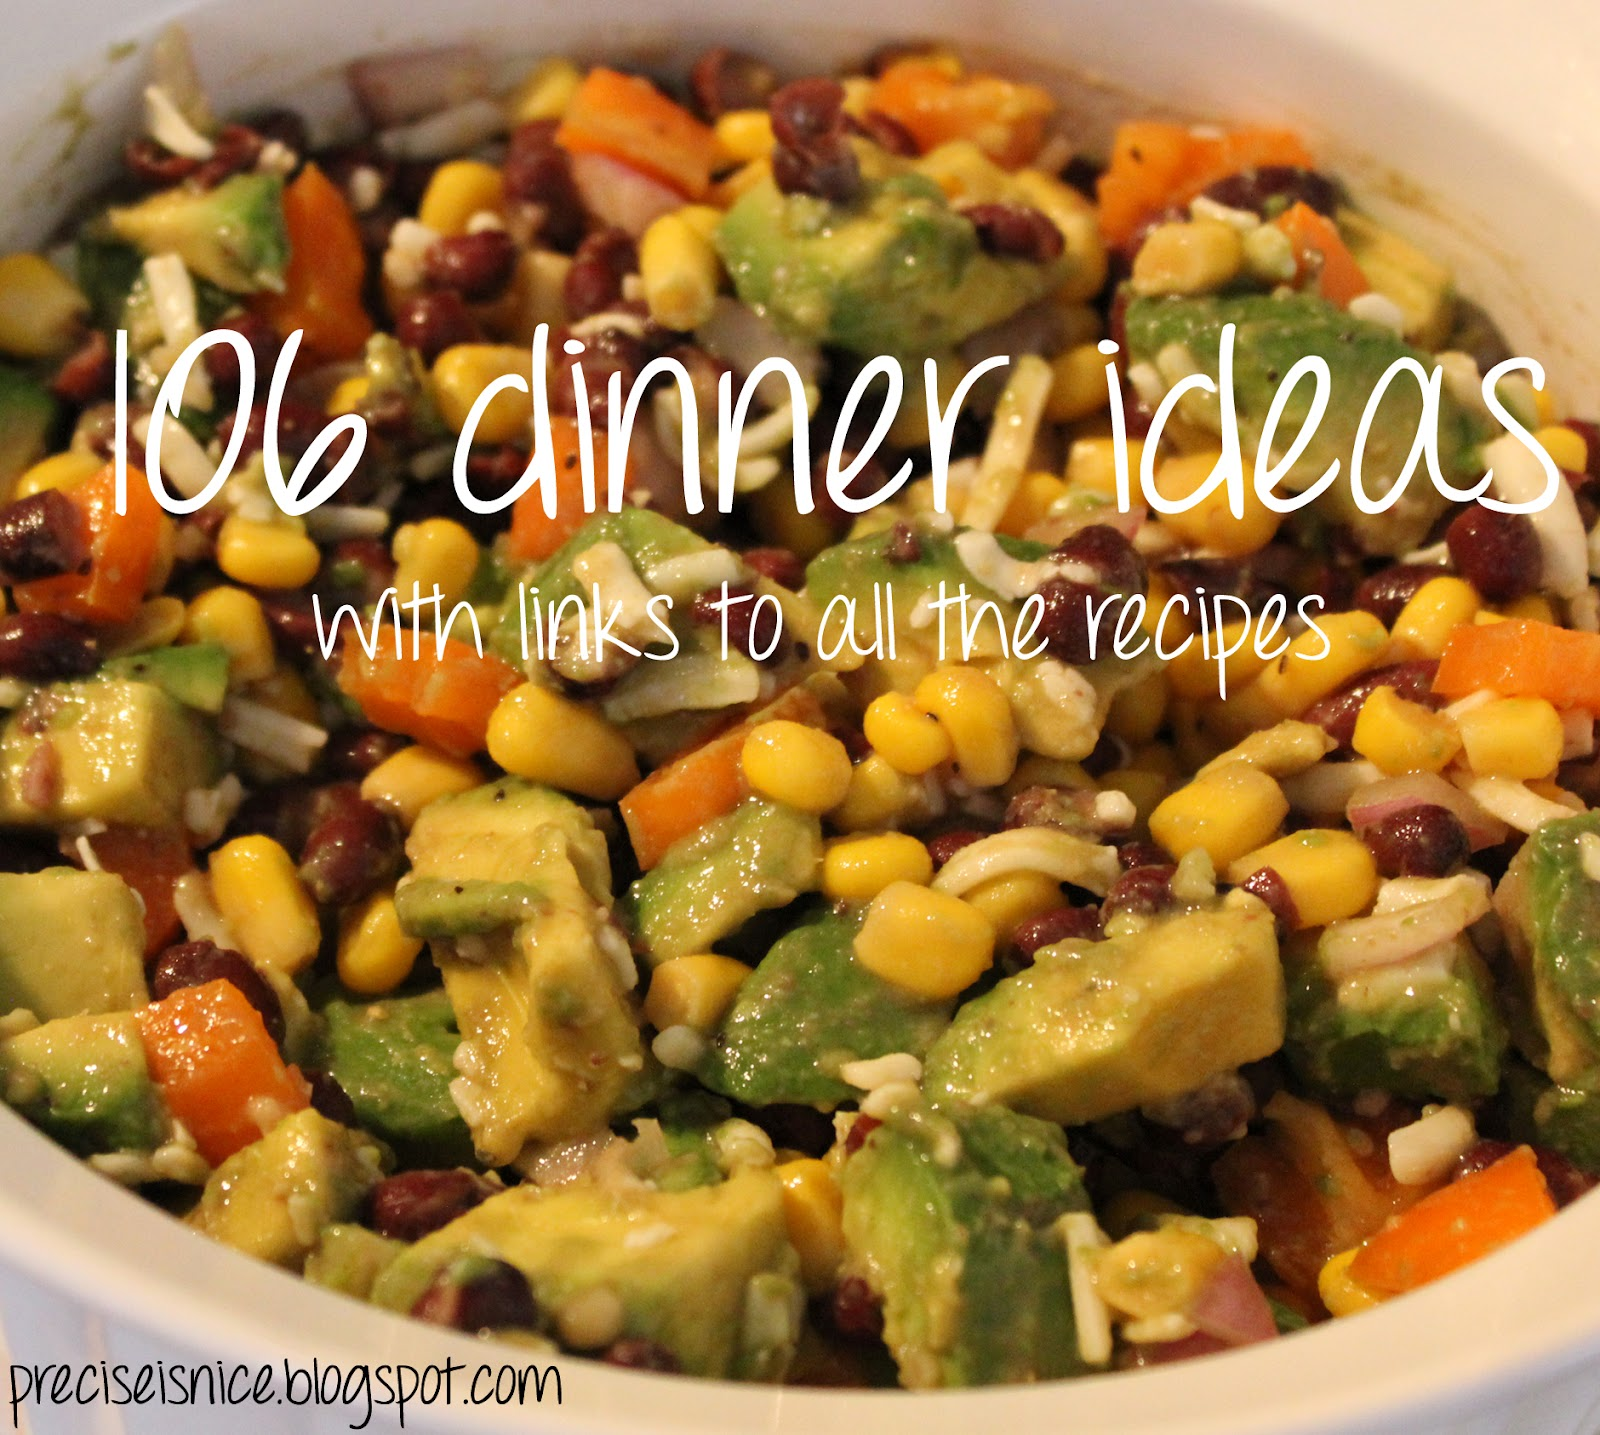 Precise Is Nice: 106 Dinner Ideas